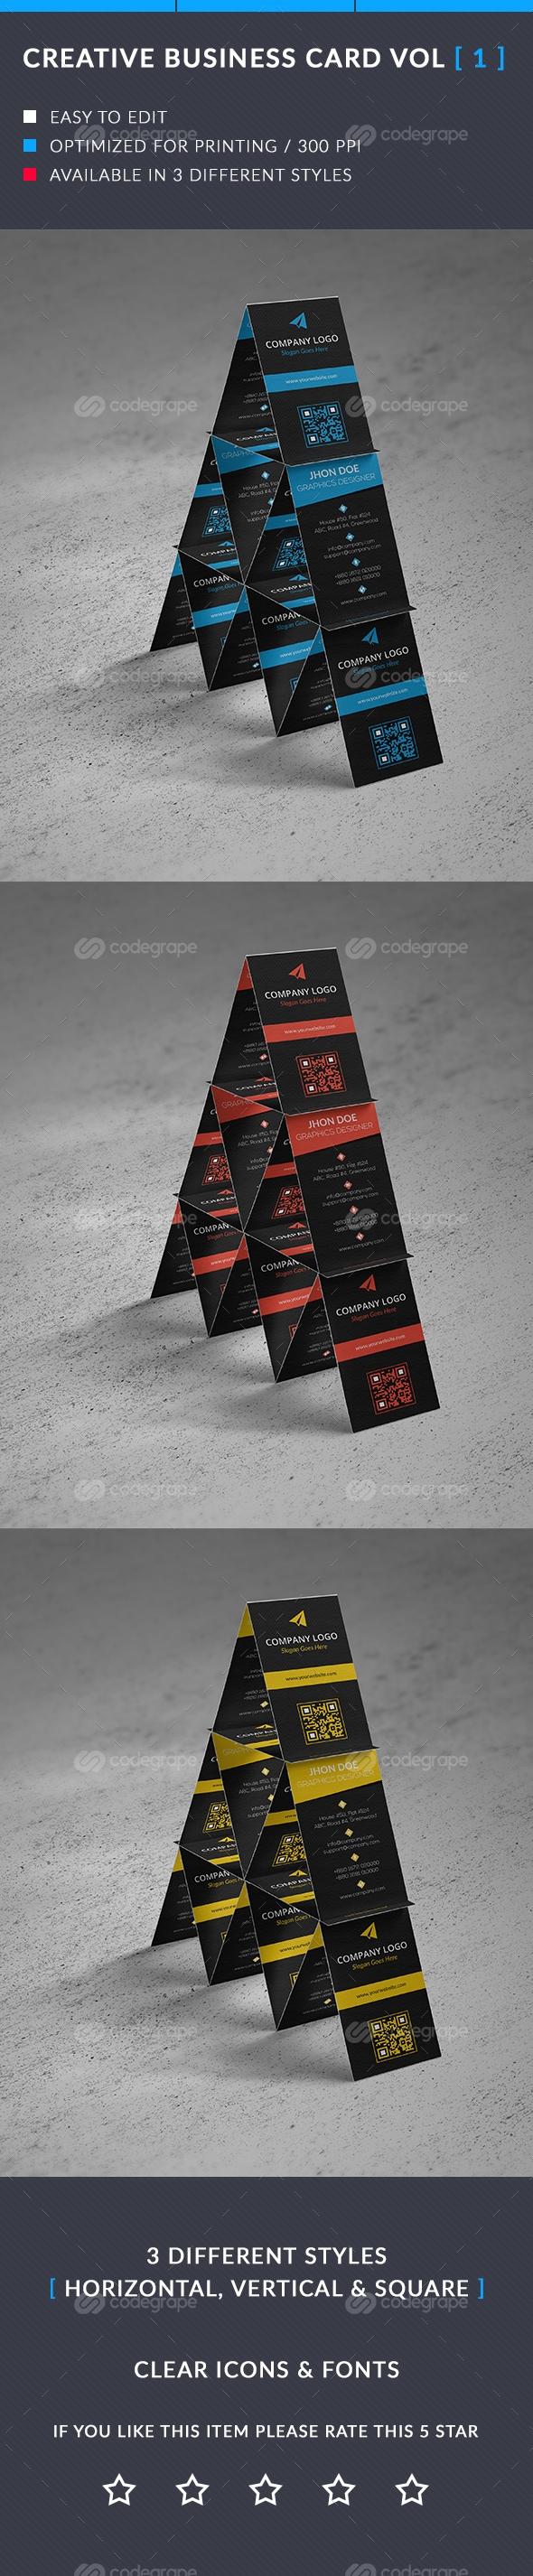 Creative Business Card Vol -1